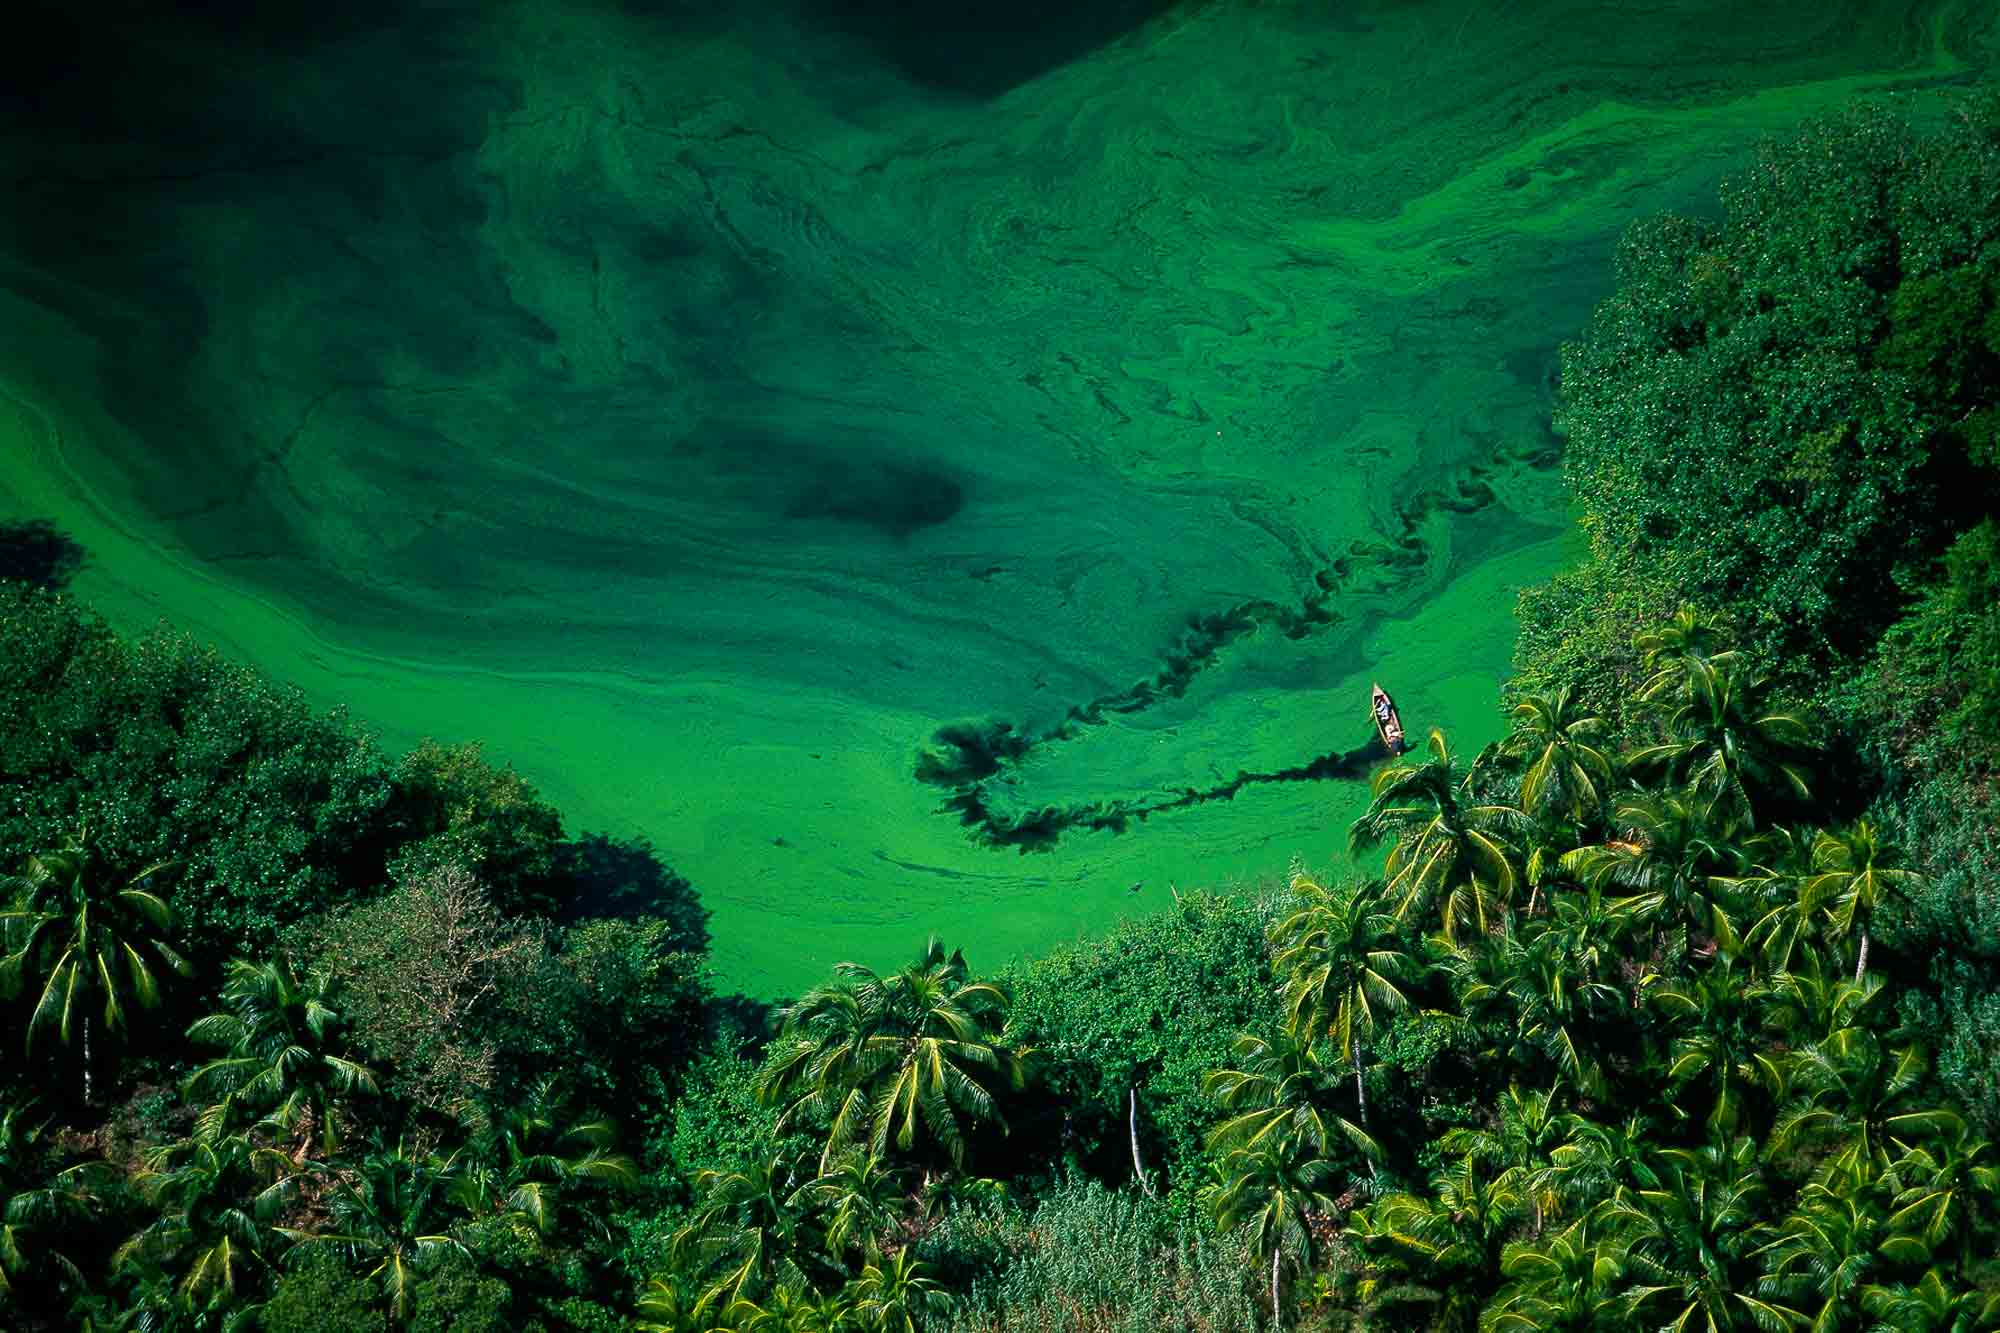 Lagoon - Yann Arthus-Bertrand